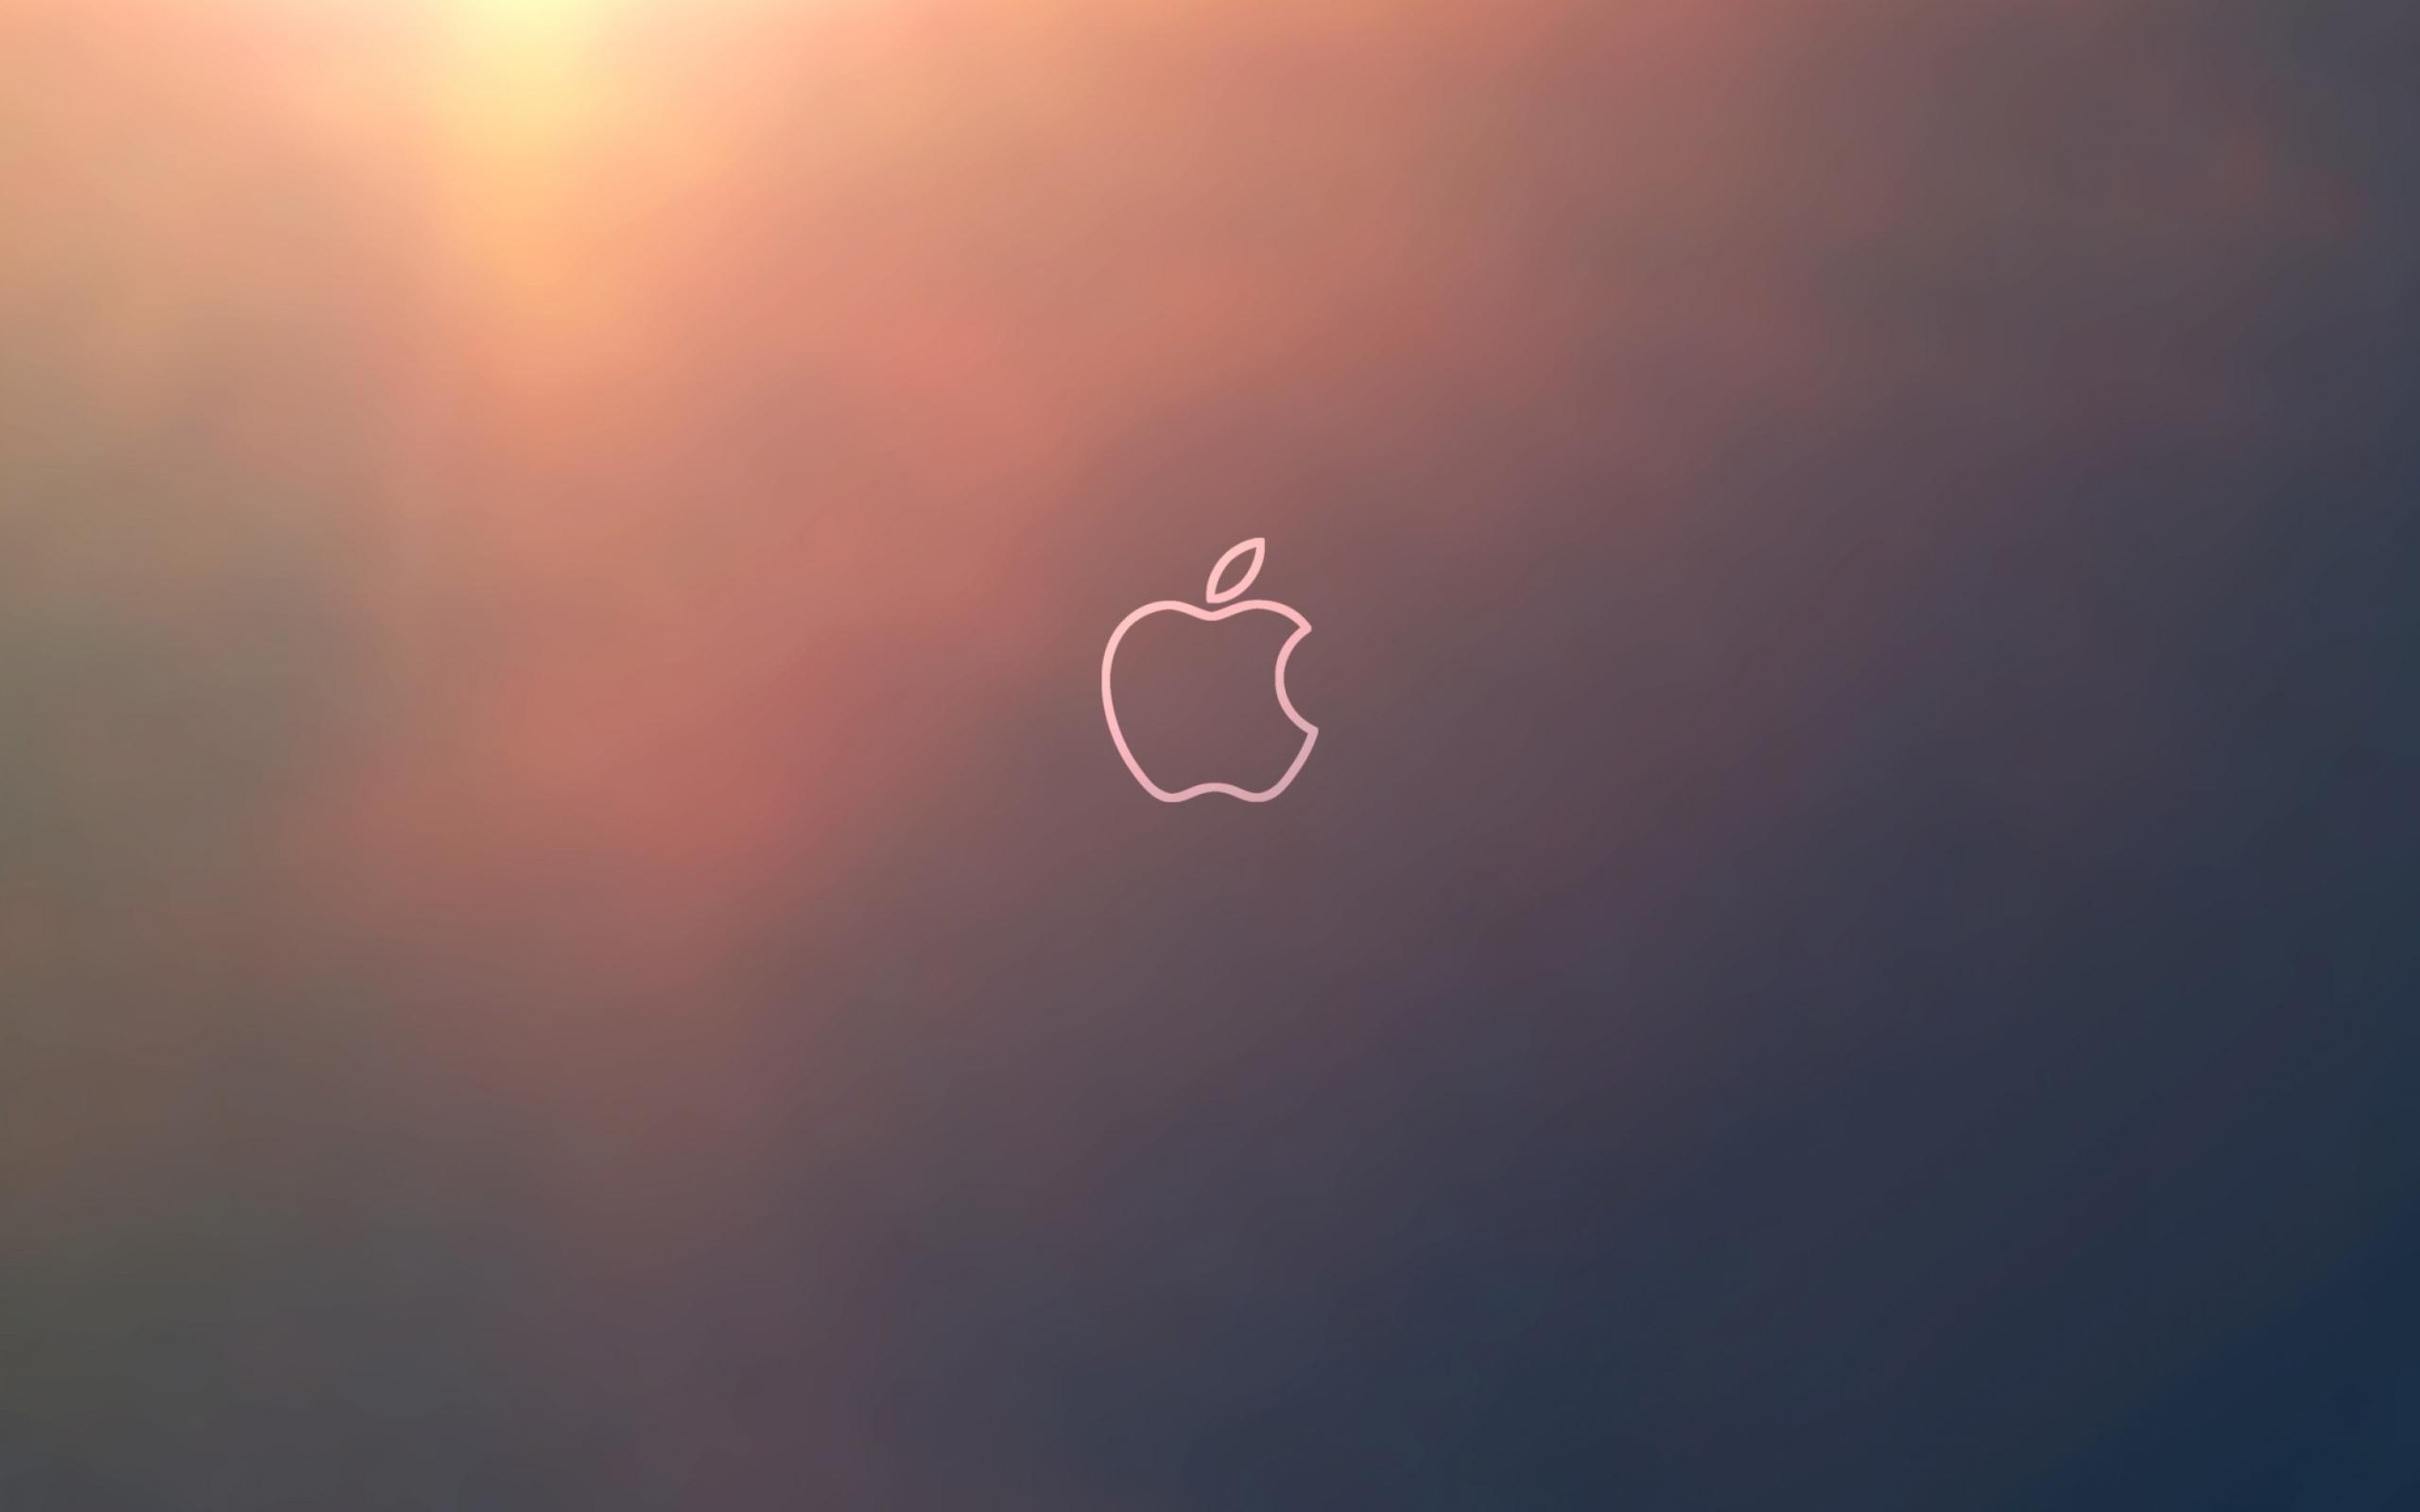 47 Macbook Pro Retina Desktop Wallpaper On Wallpapersafari